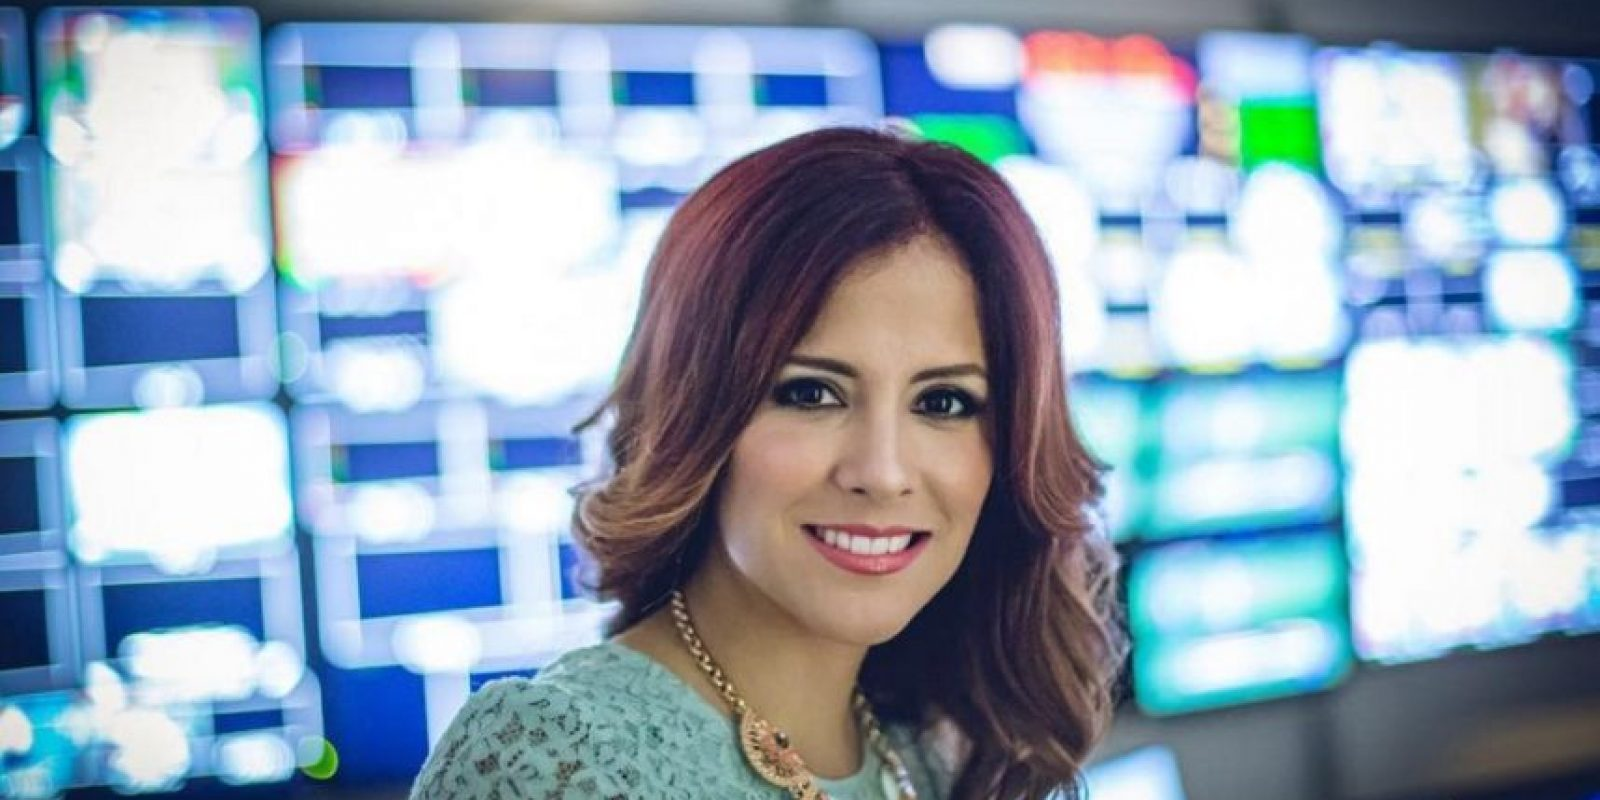 Adriana Monsalve nació en Venezuela. Foto:Vía instagram.com/adriana.monsalve